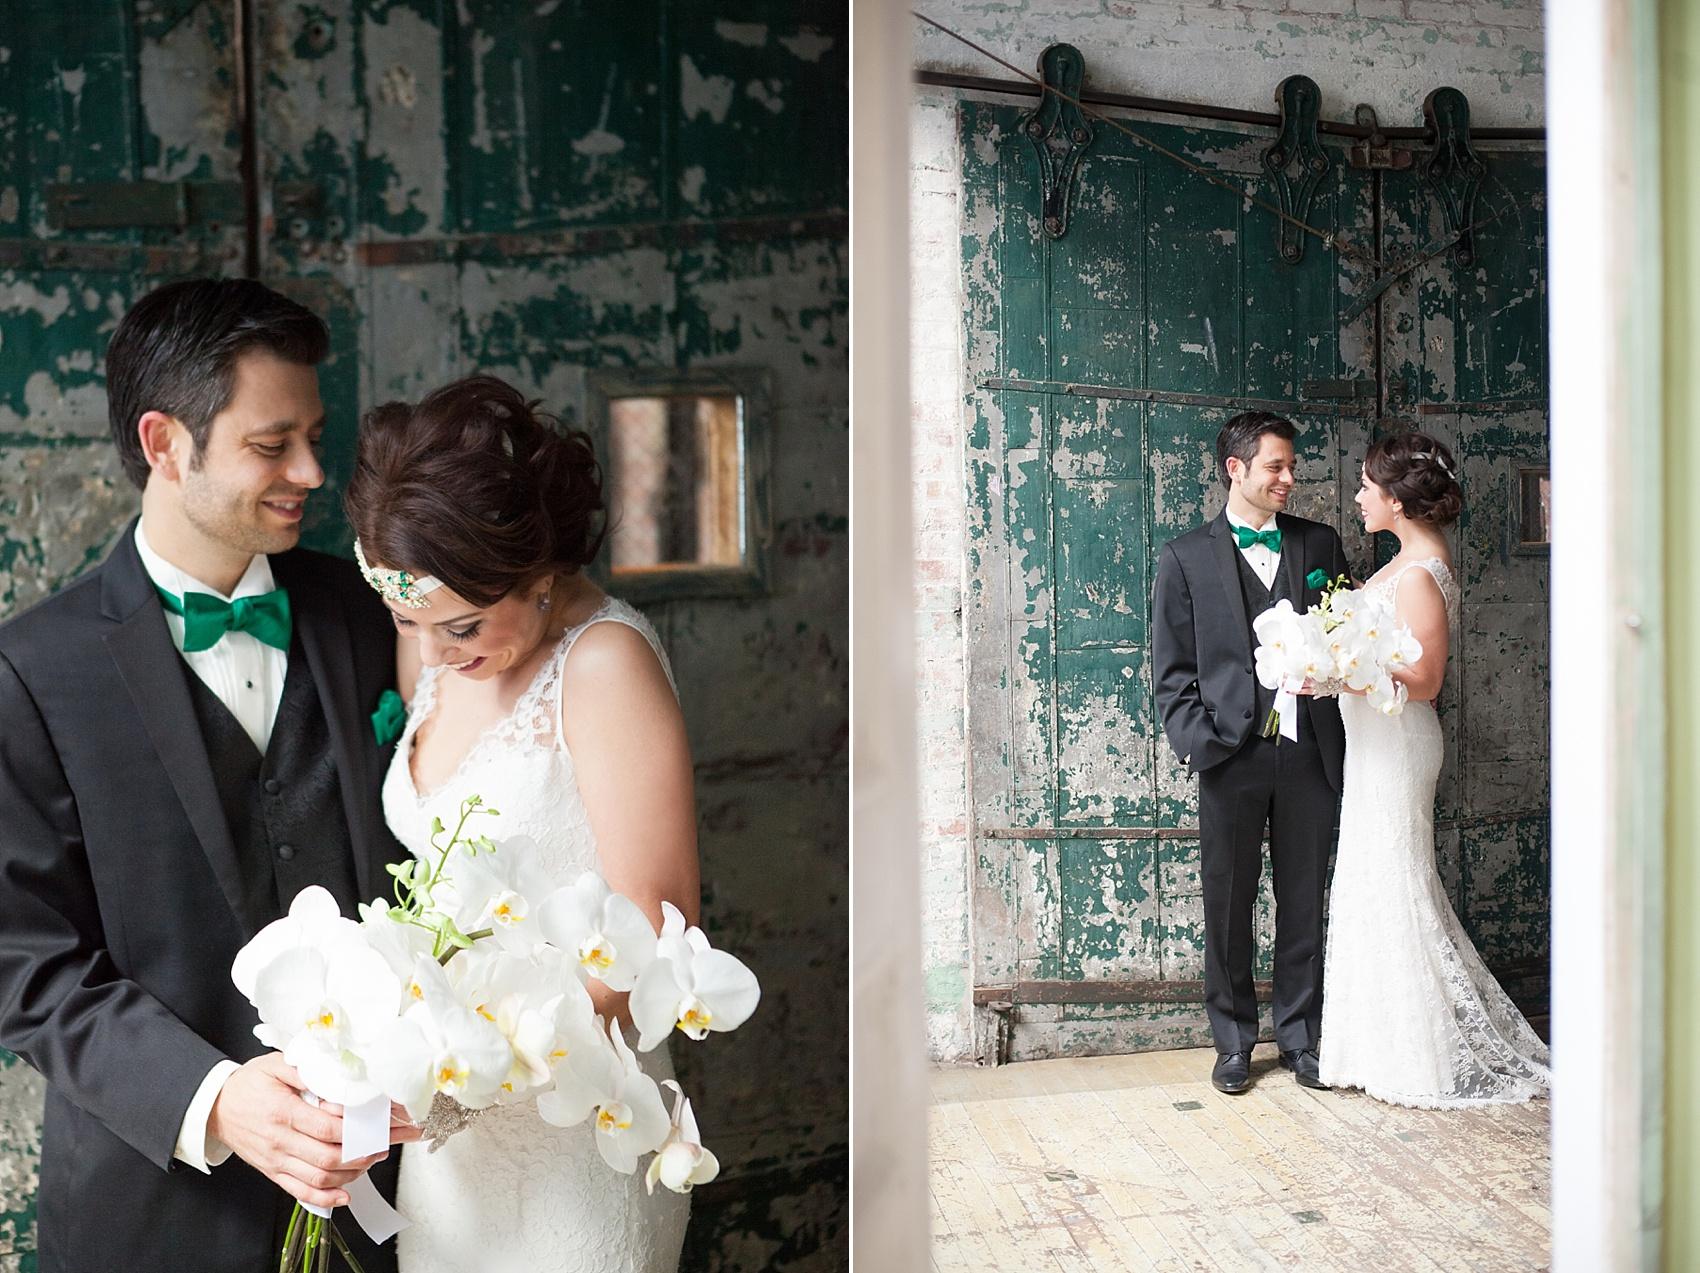 Metropolitan Building vintage 1920's wedding. Images by Mikkel Paige Photography.